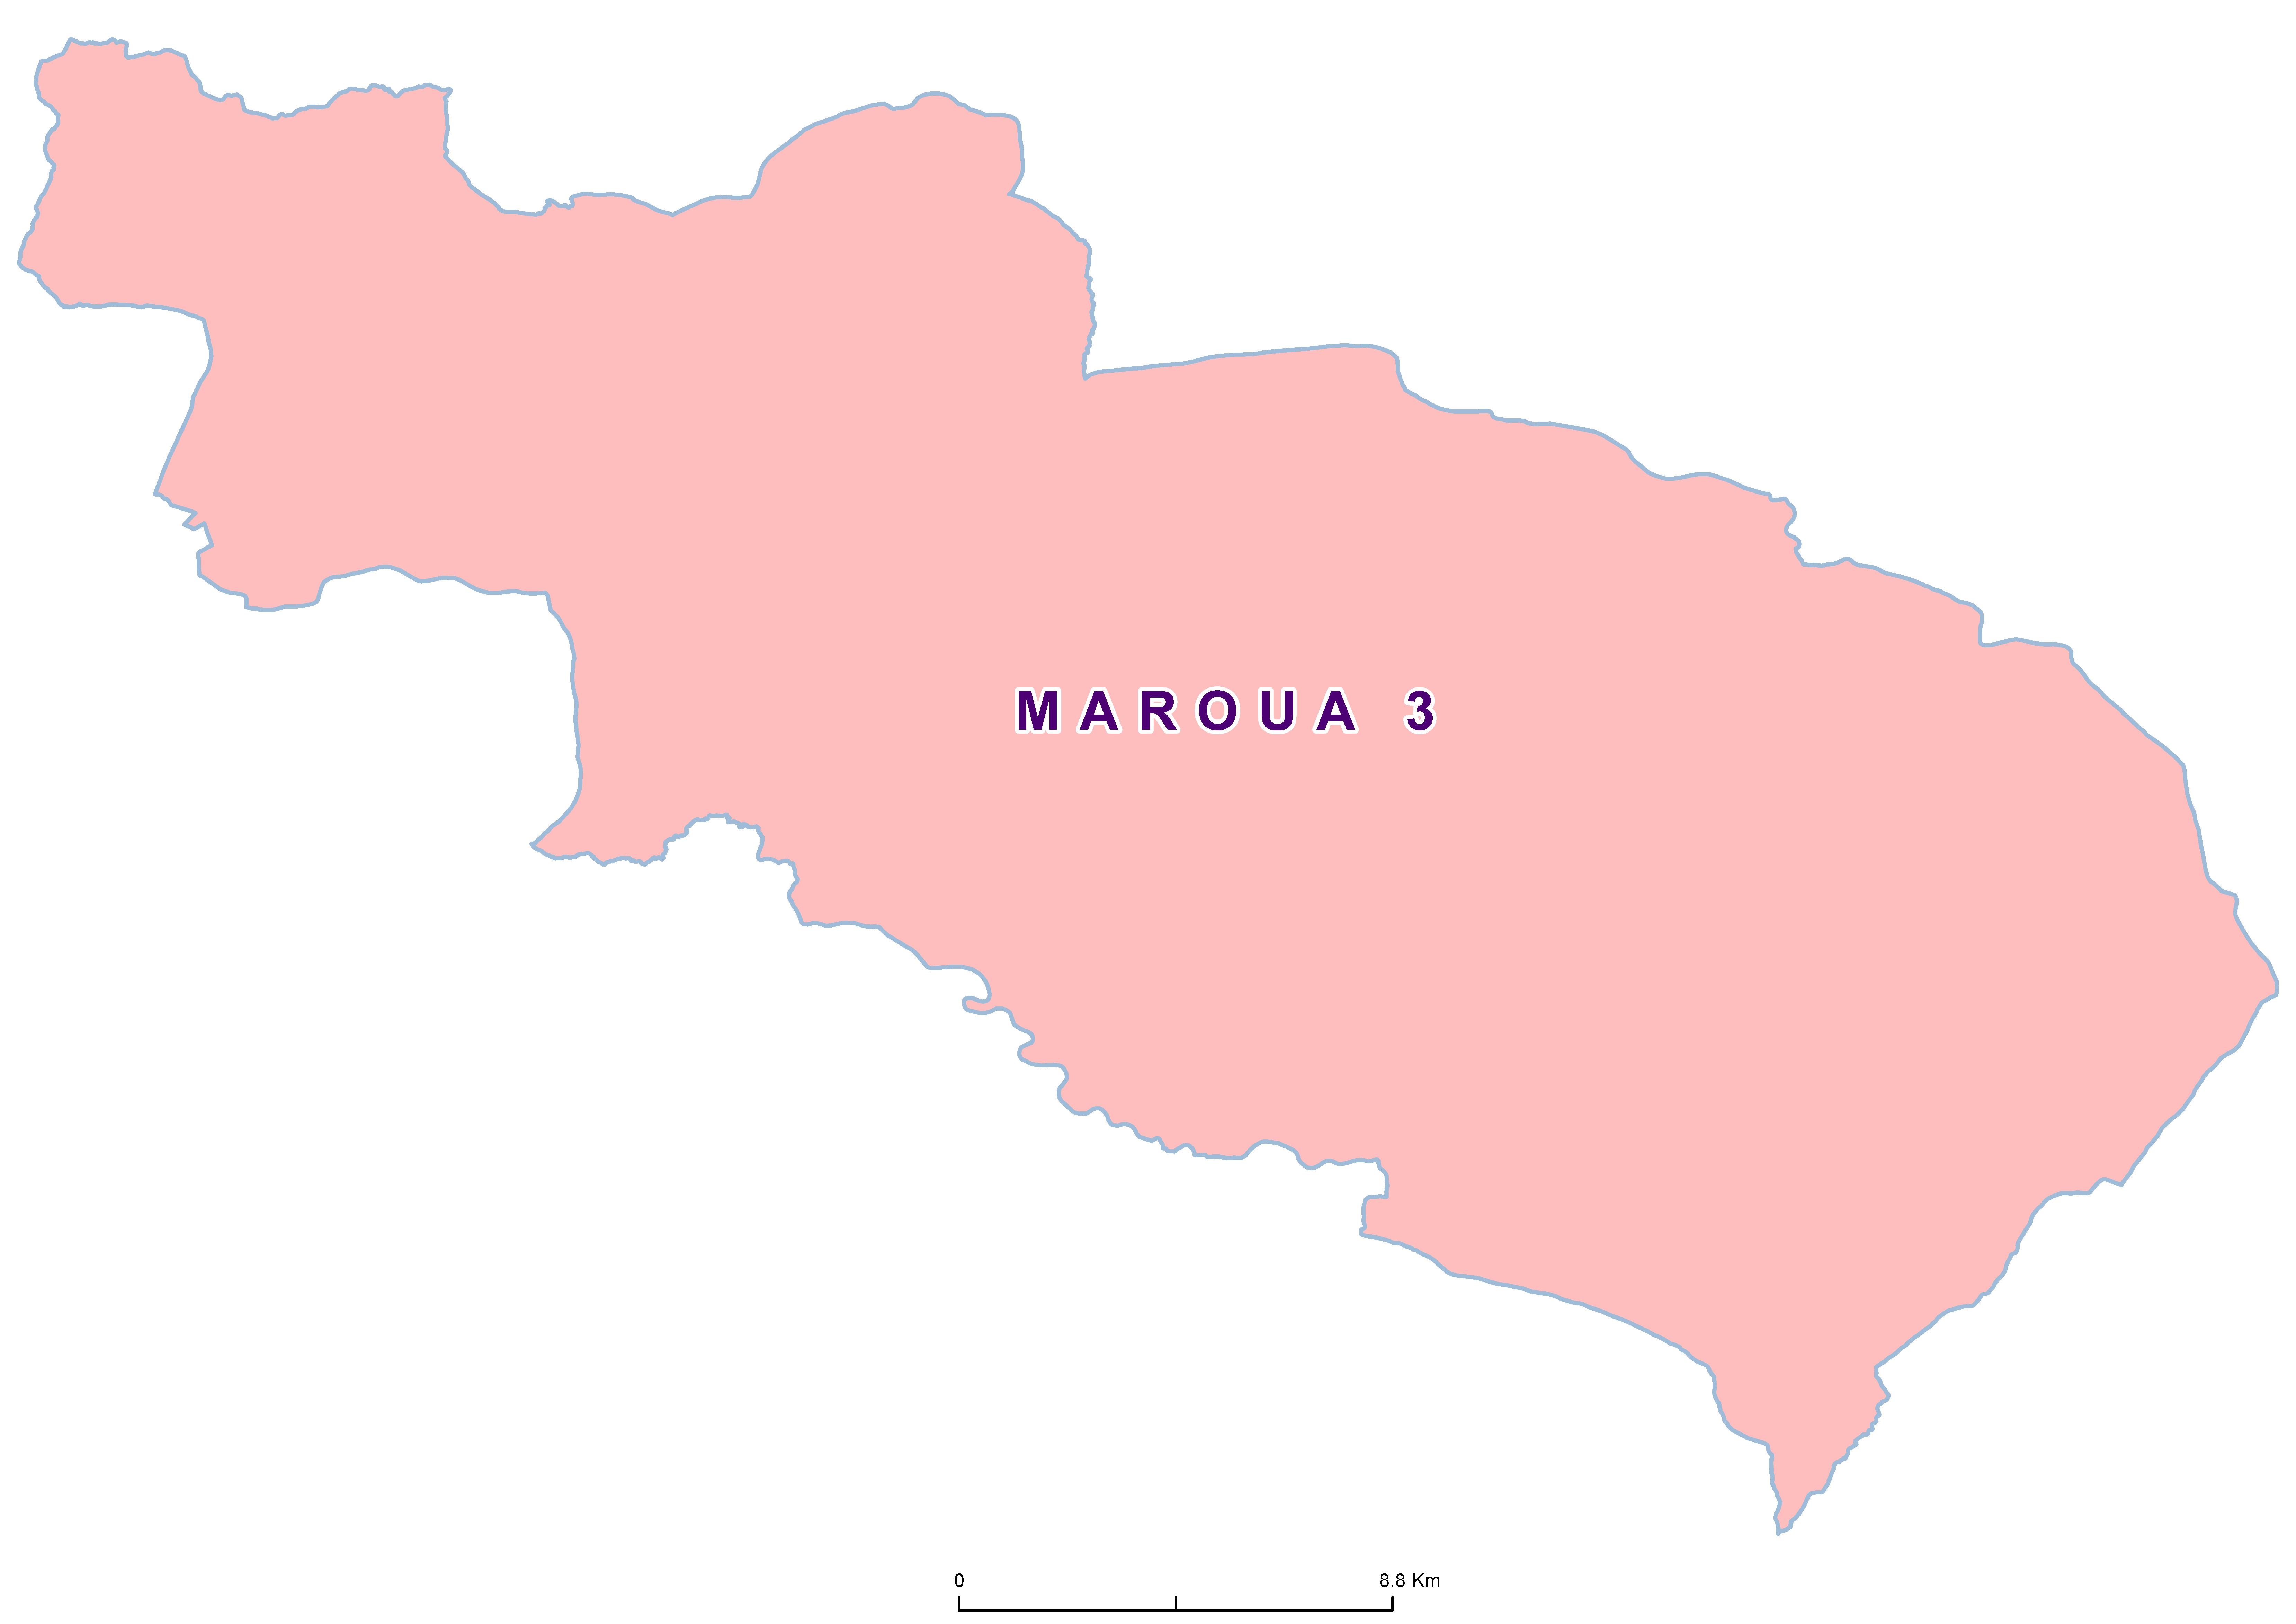 Maroua 3 Max STH 19850001